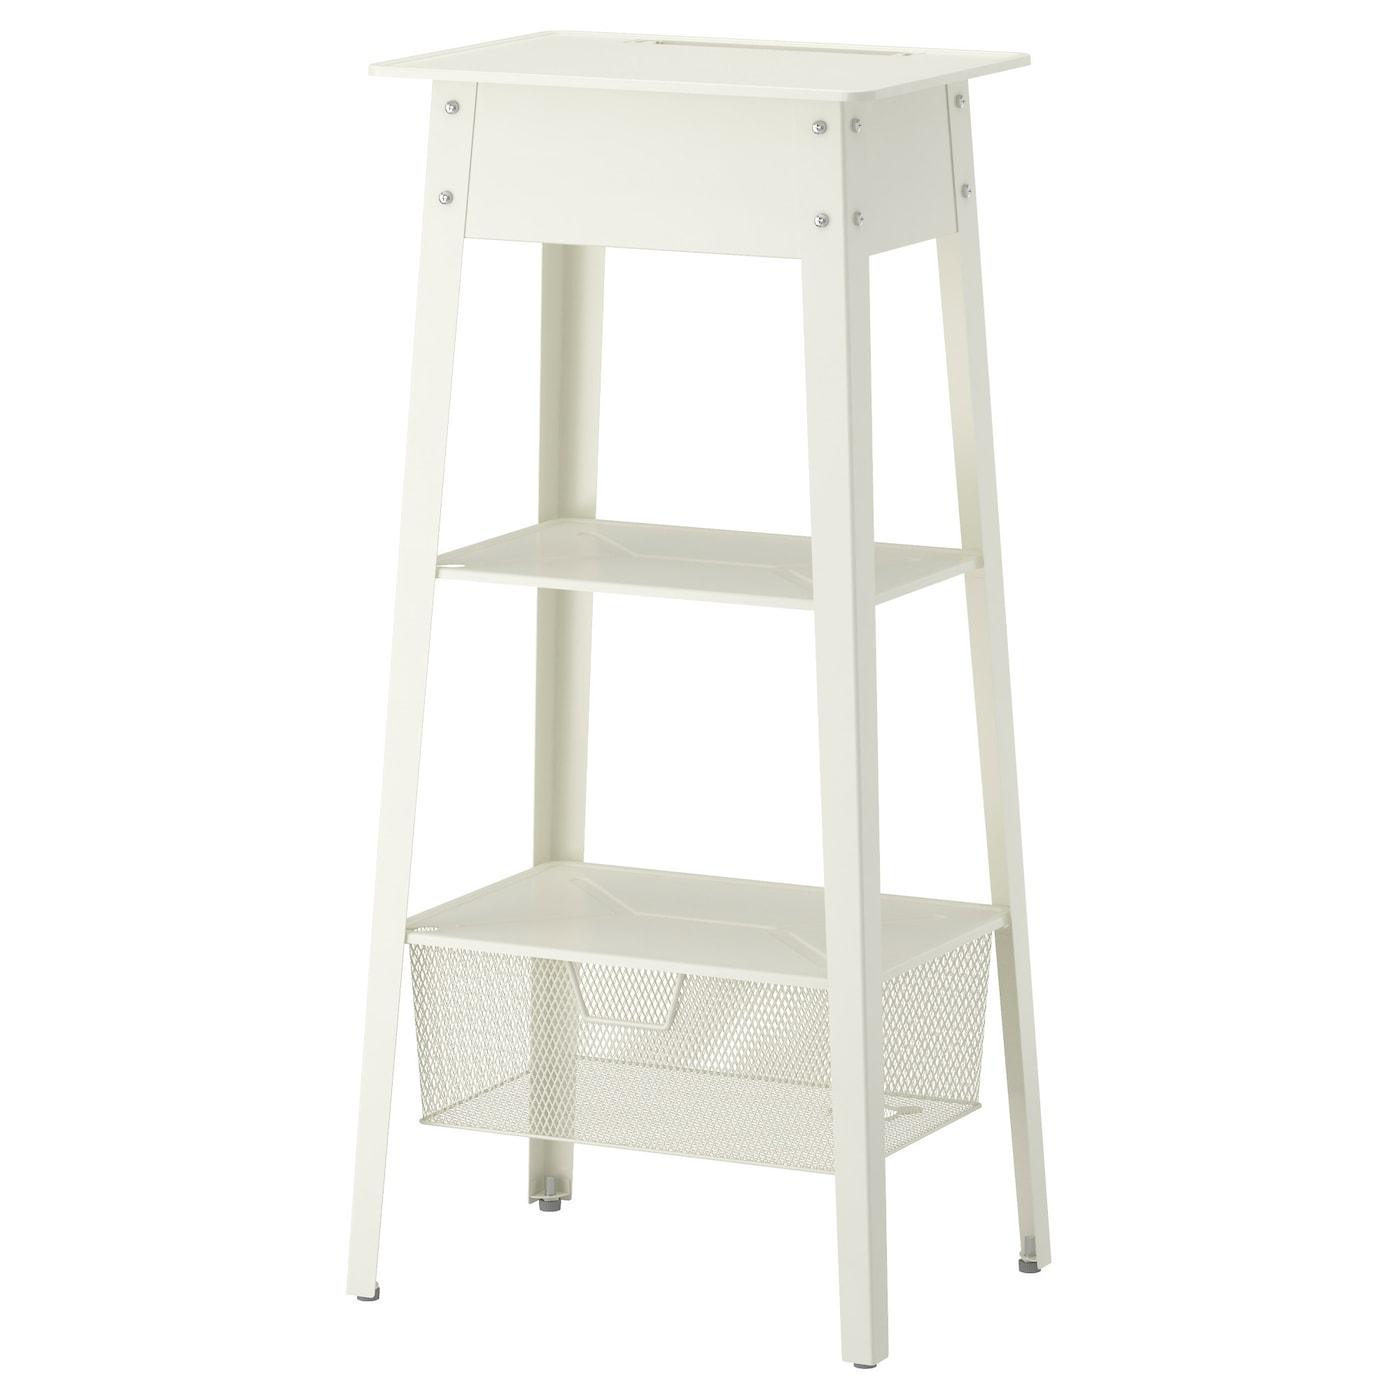 ikea ps 2014 standing laptop station white ikea. Black Bedroom Furniture Sets. Home Design Ideas